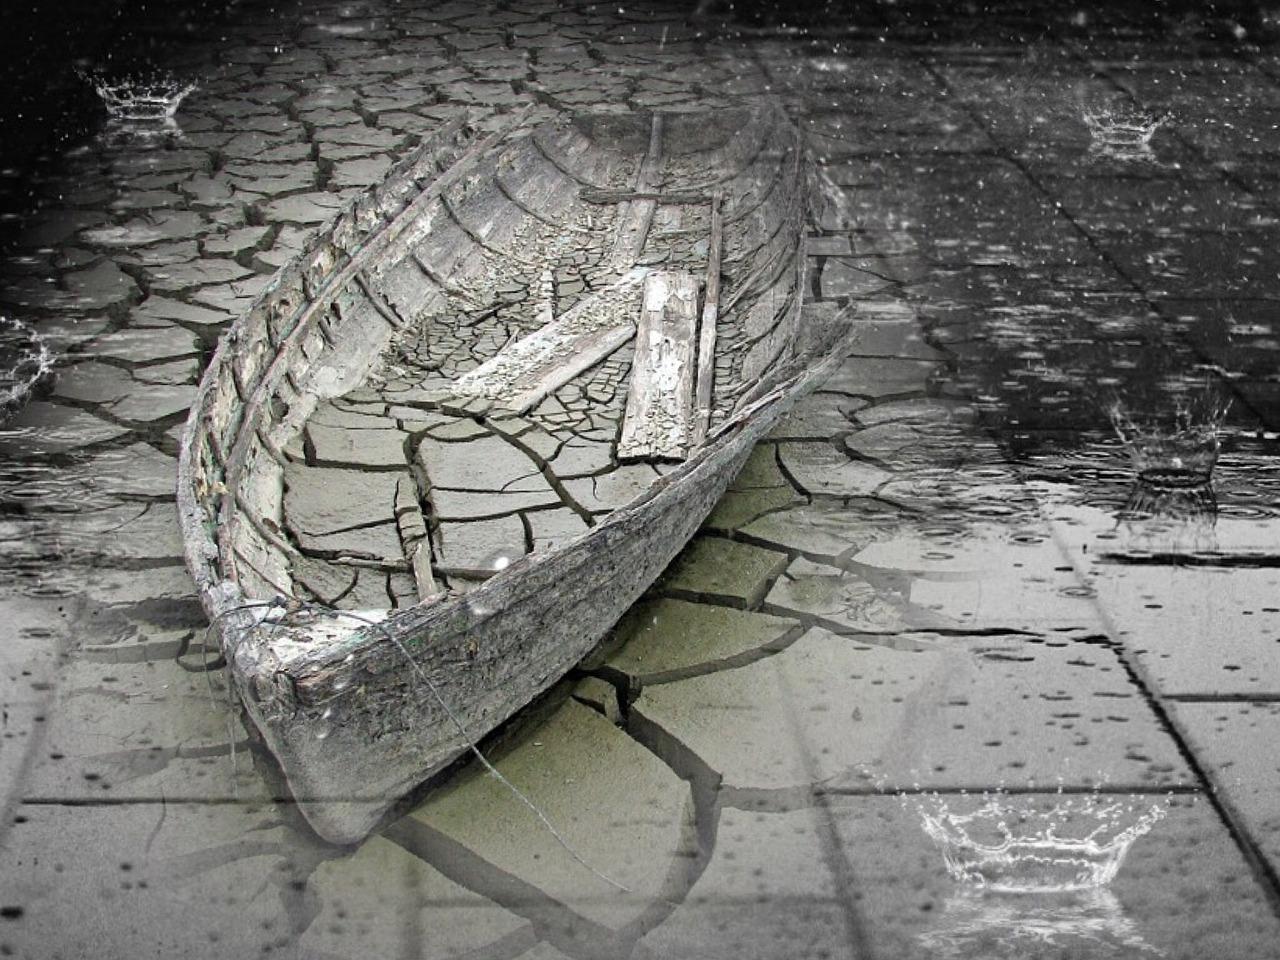 lod-povodne-pixabay-telo-a-duse-v-harmonii